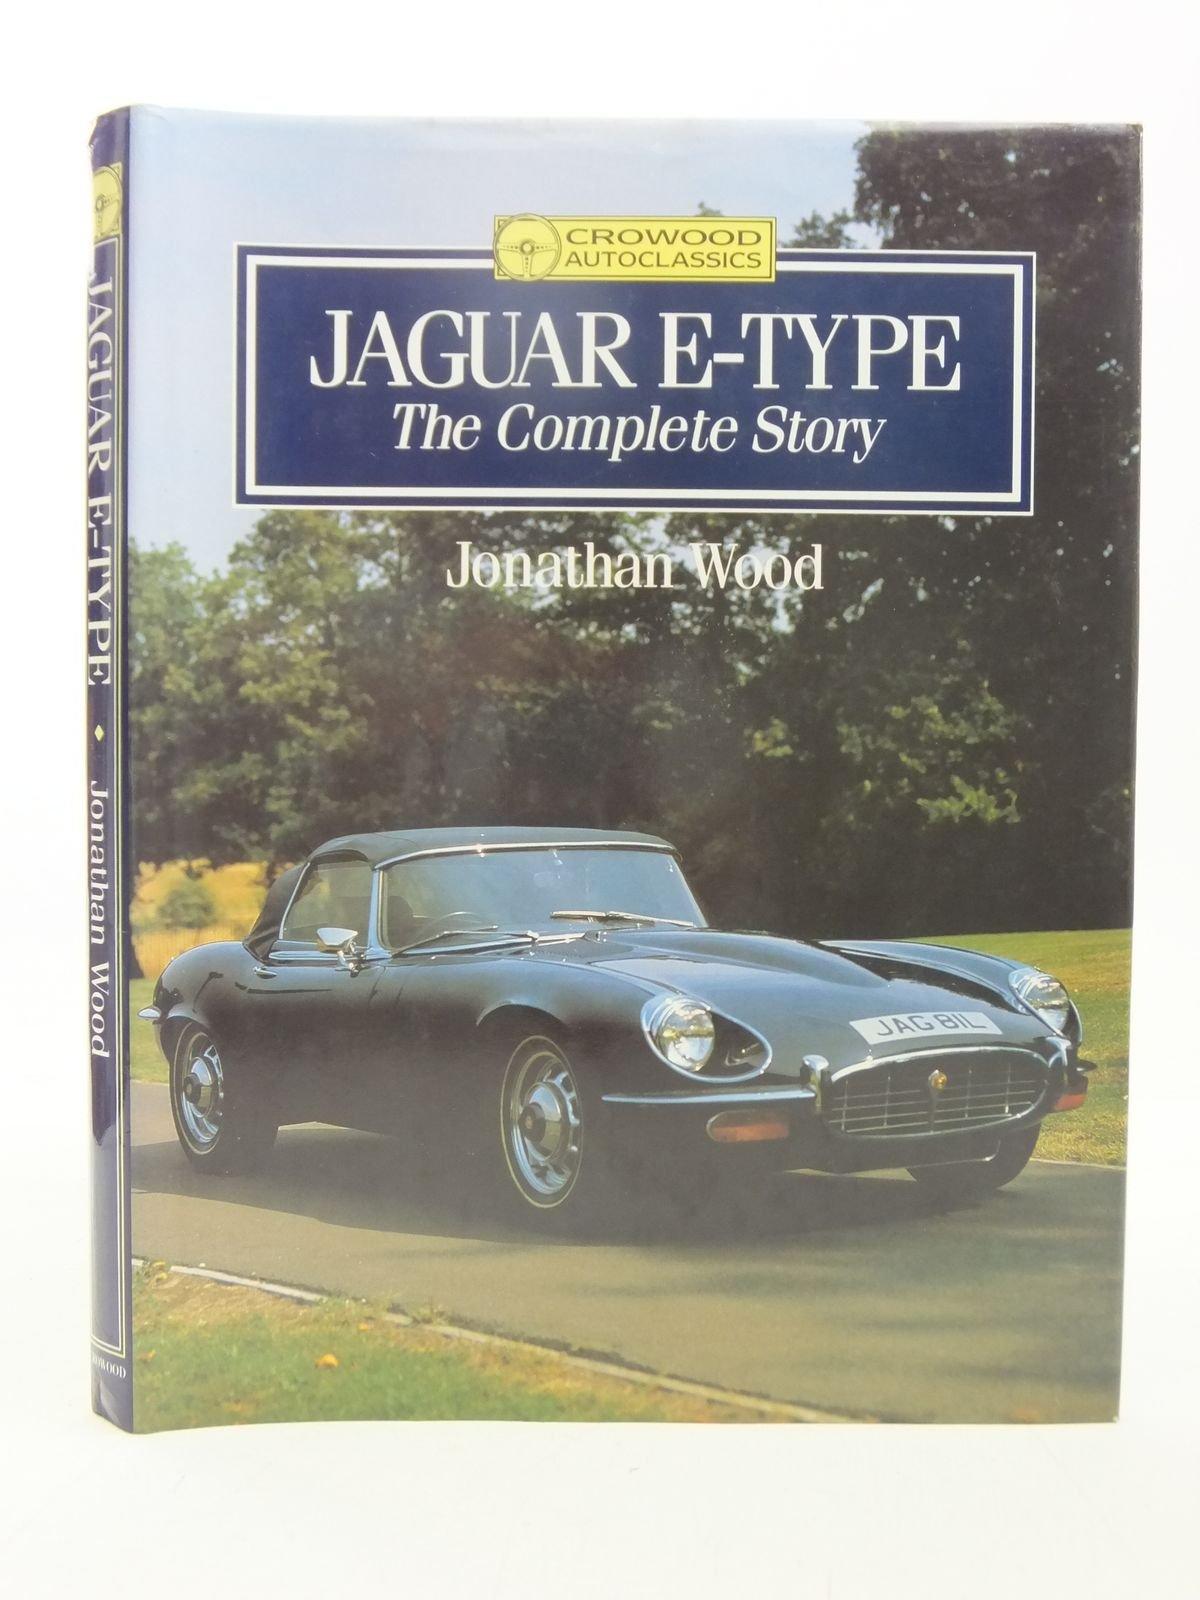 Jaguar E-Type: The Complete Story (Crowood Autoclassics)